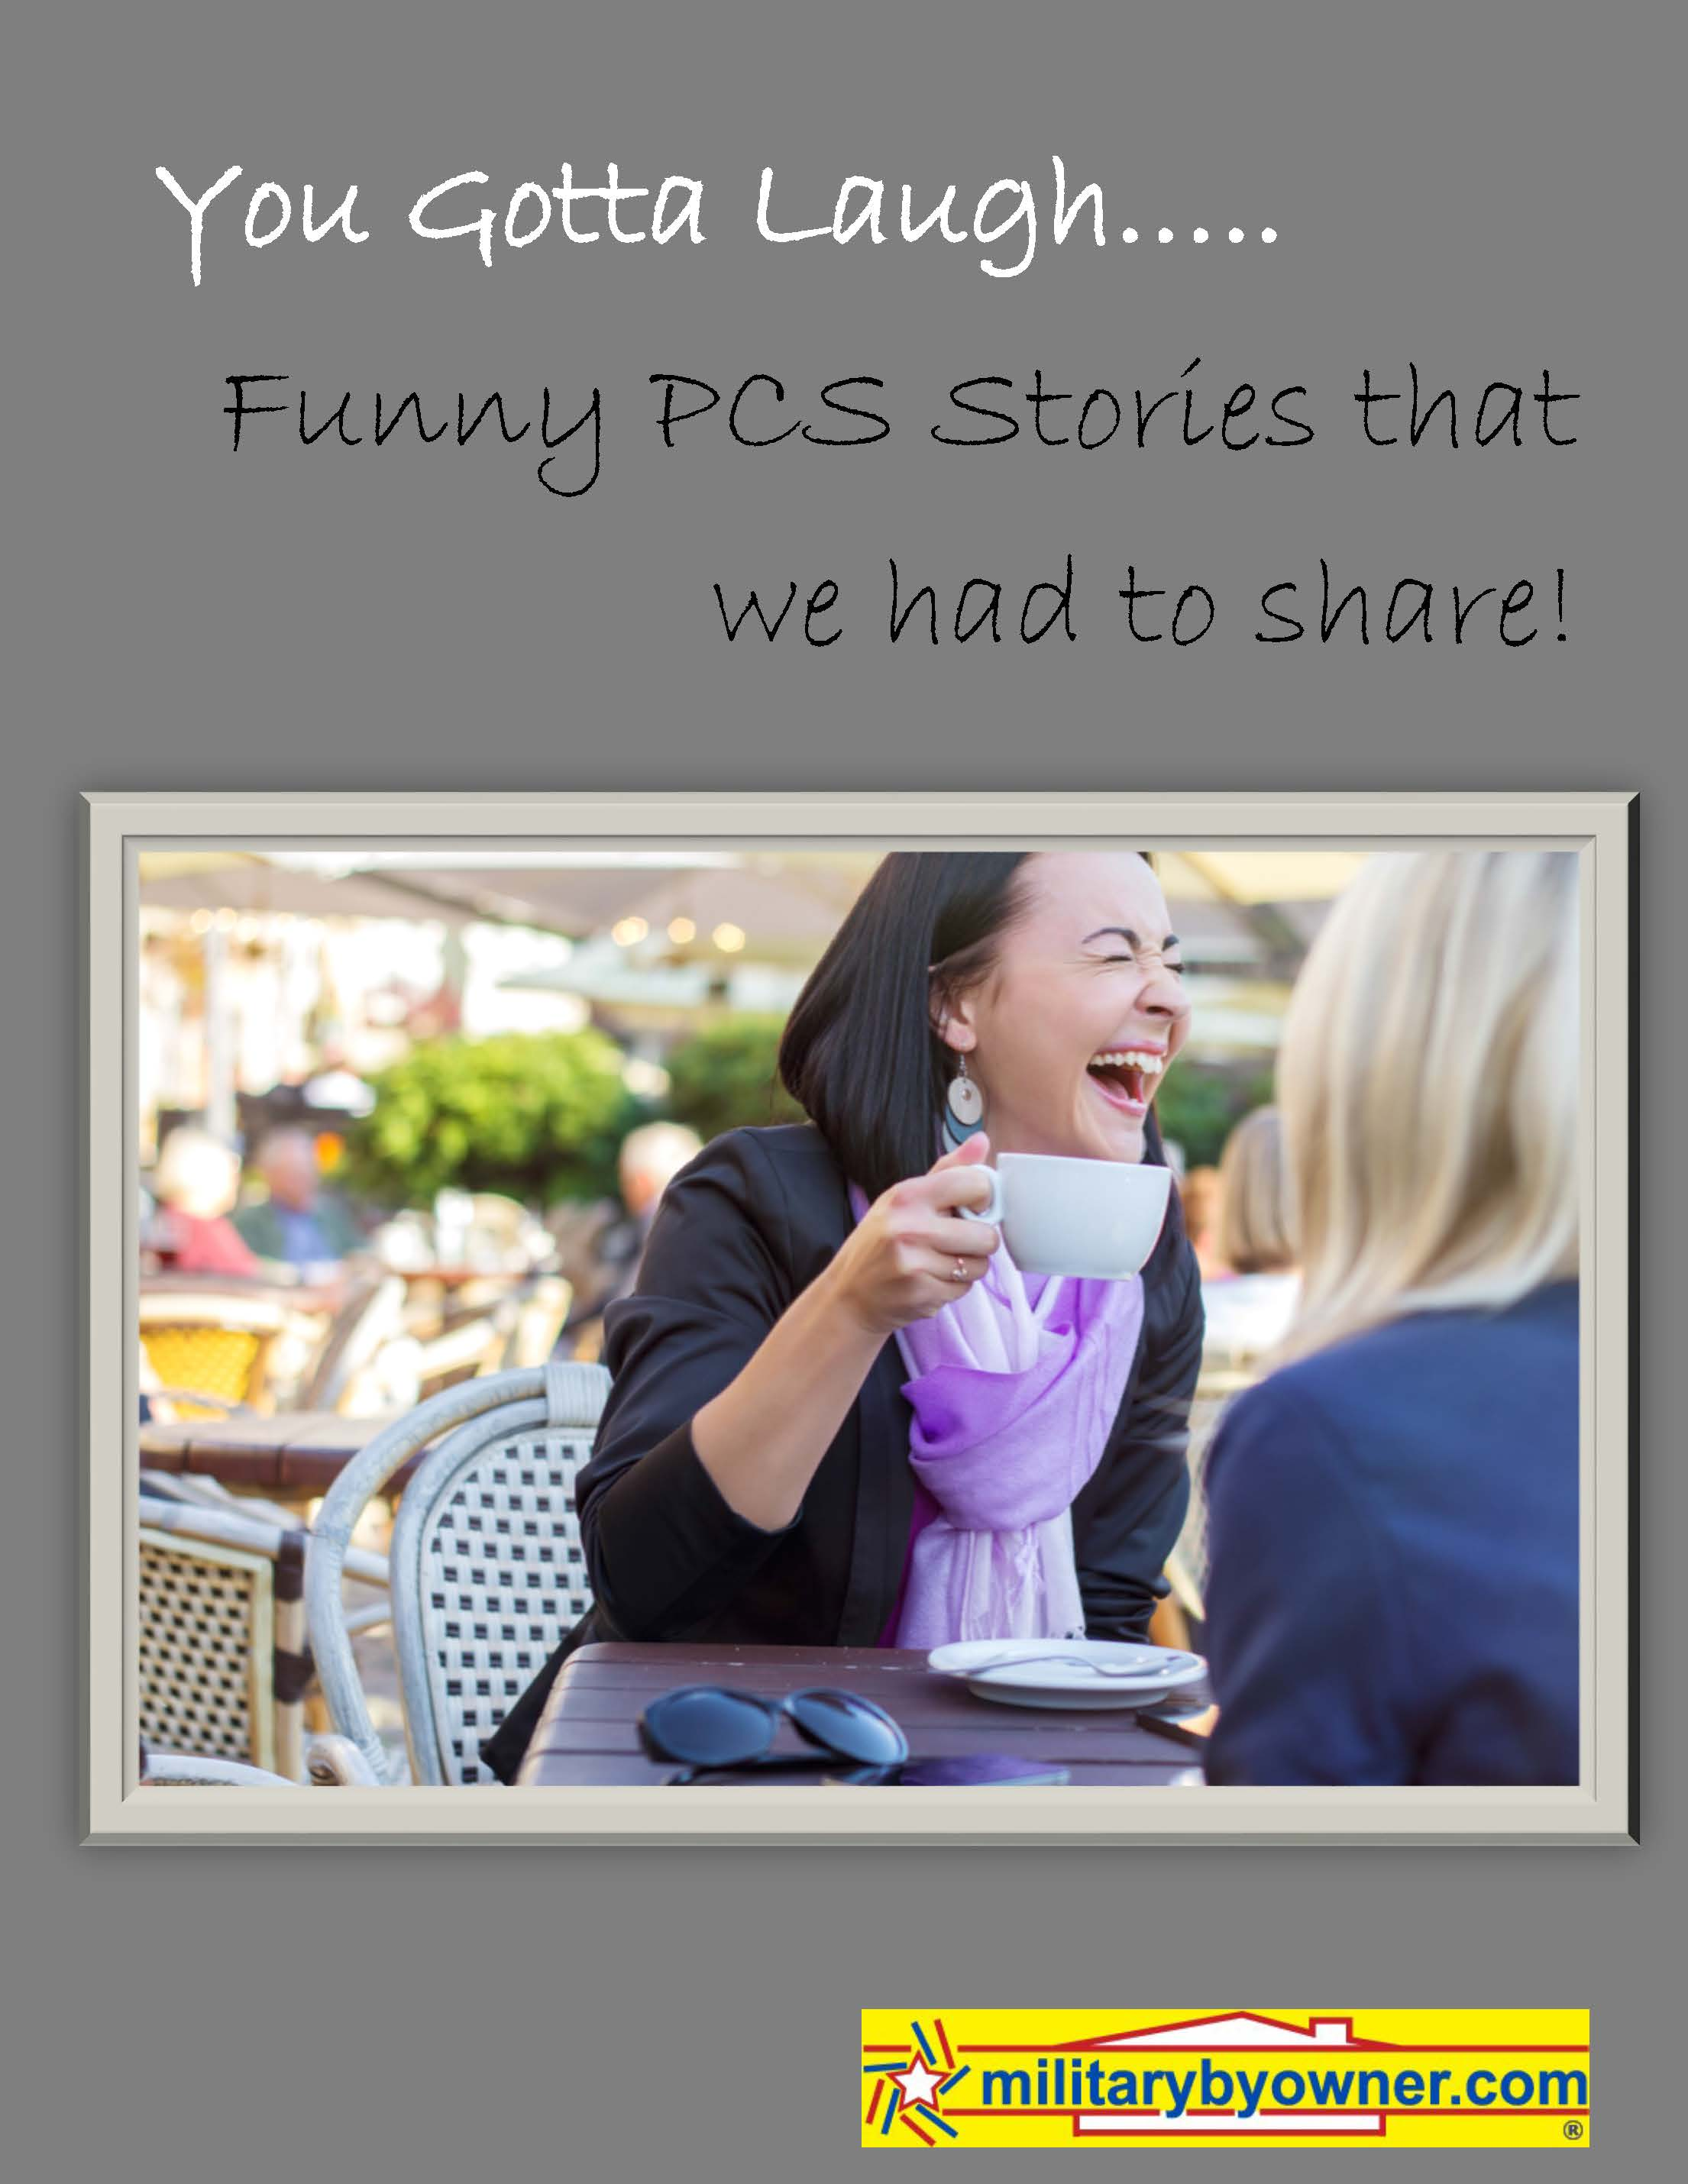 PCS4_You_Gotta_Laugh_Funny_PCS_Stories_cover.jpg